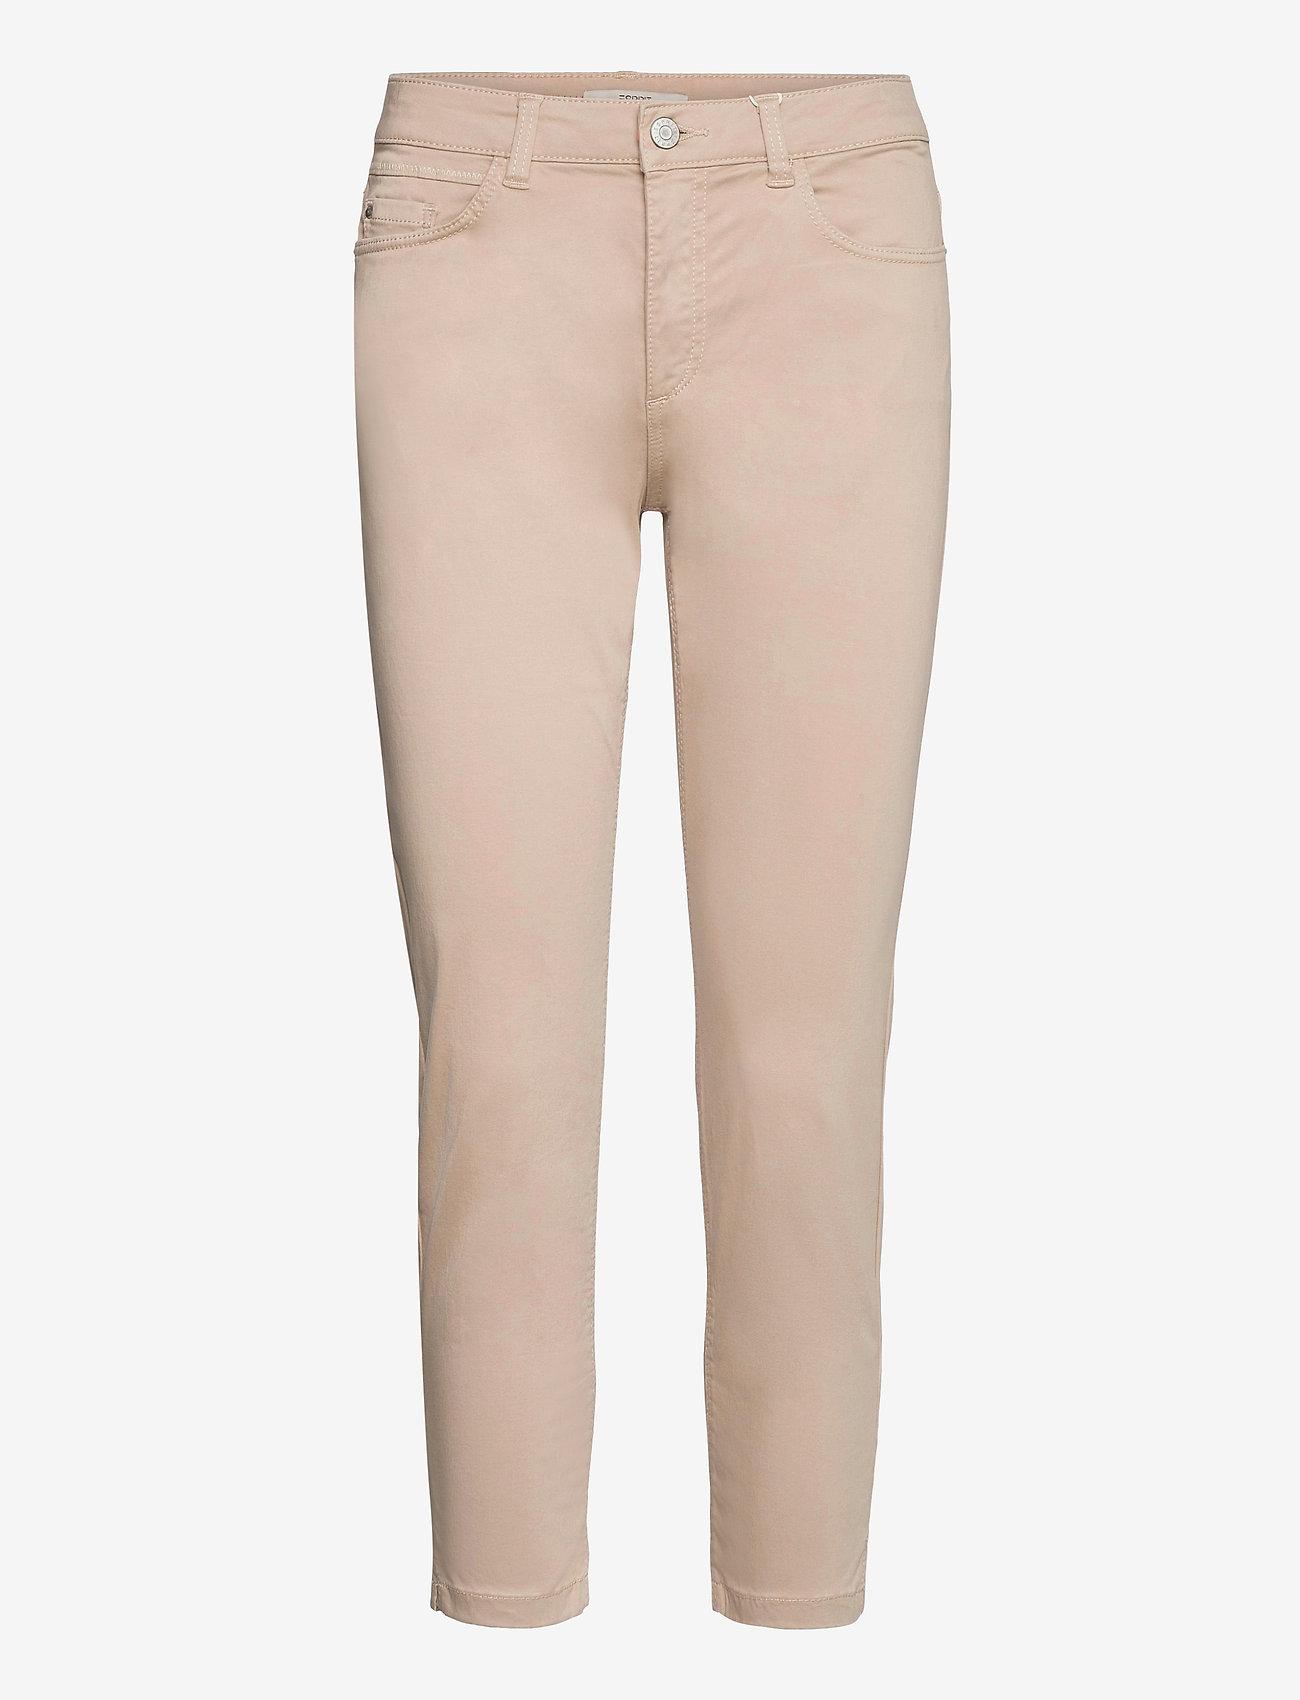 Esprit Casual - Pants woven - slim fit bukser - light beige - 0